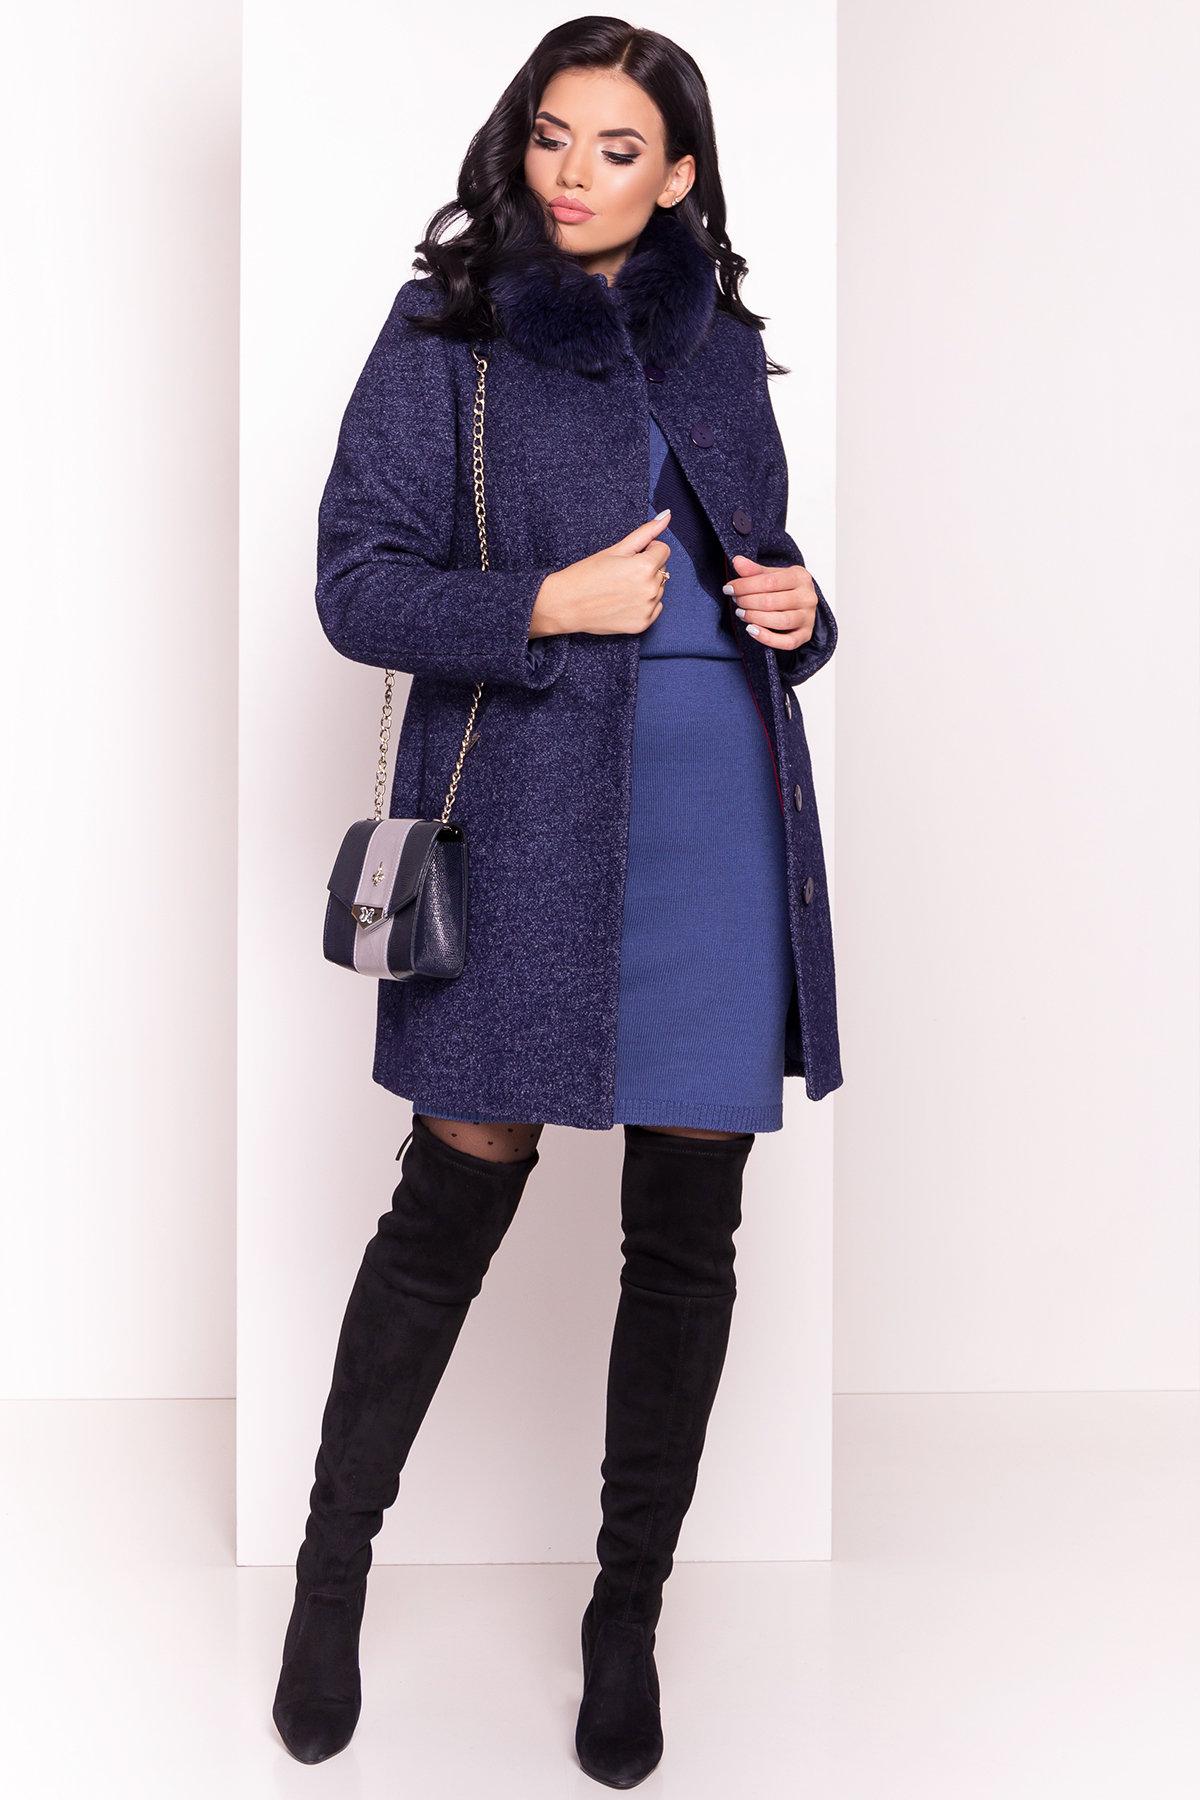 Пальто зима Сплит 3359 АРТ. 18862 Цвет: Темно-синий - фото 1, интернет магазин tm-modus.ru